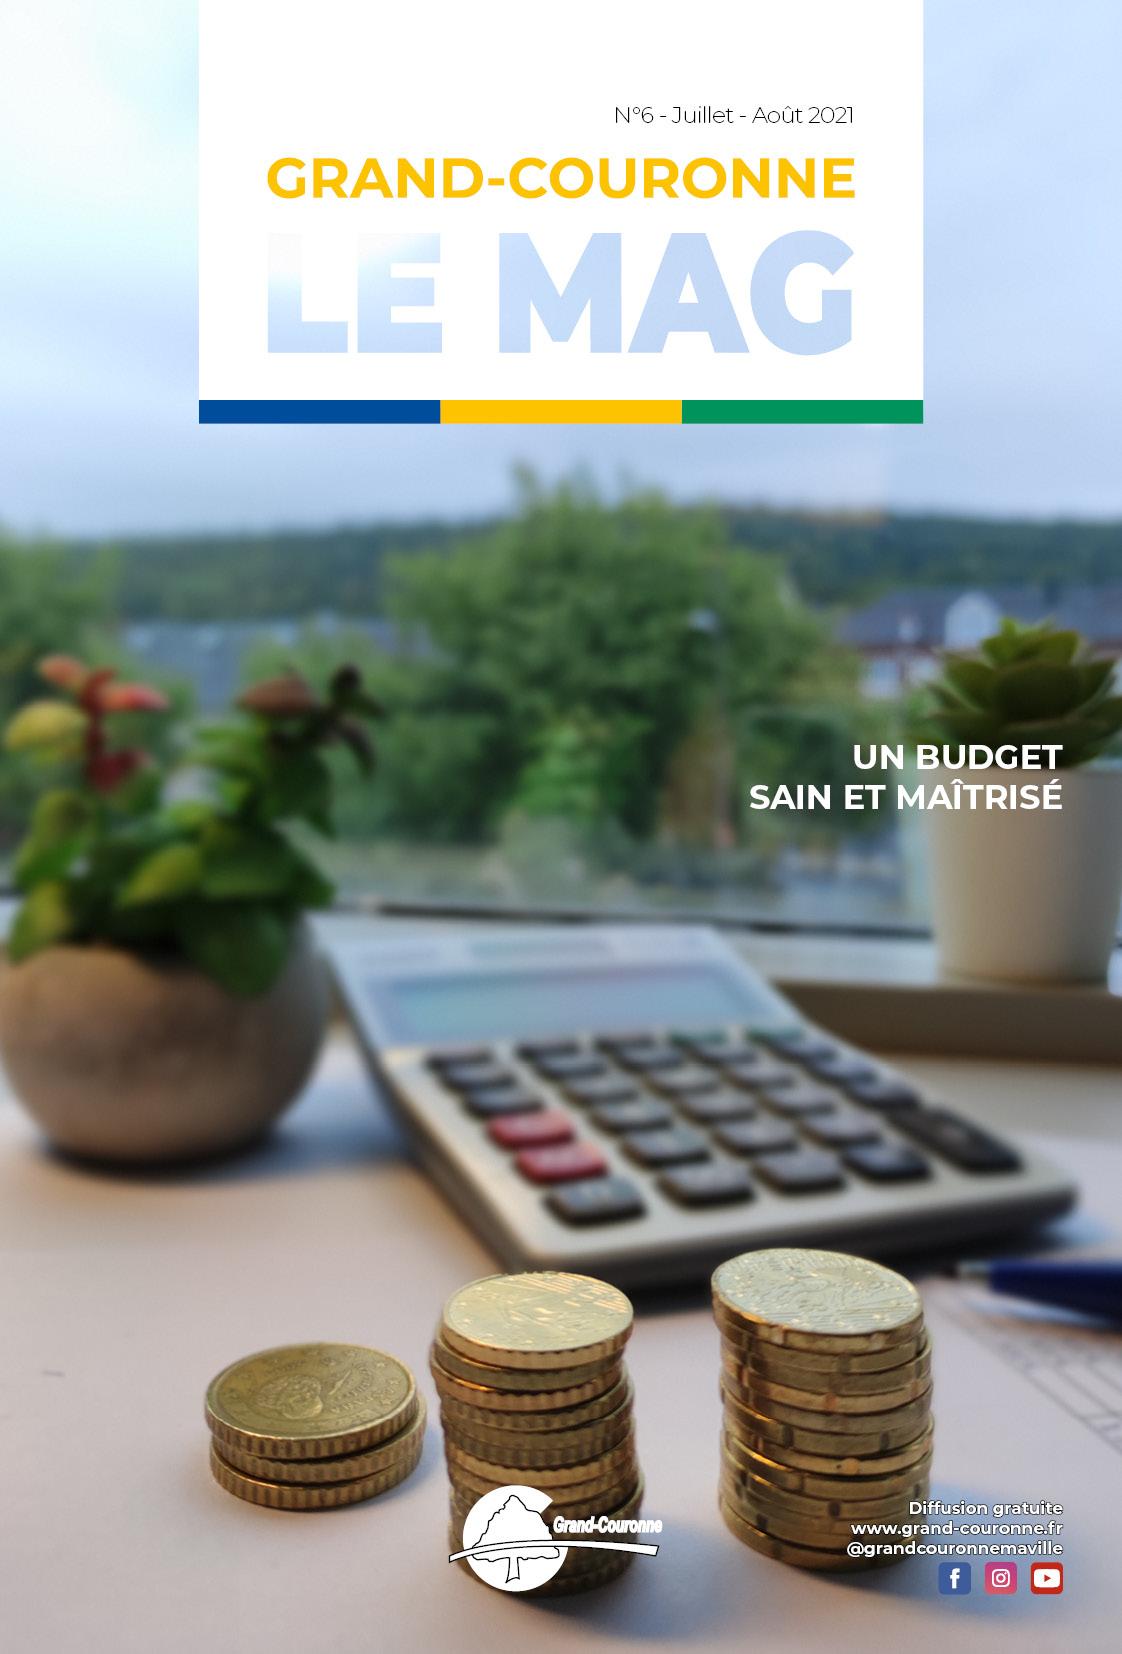 Grand-Couronne Le Mag